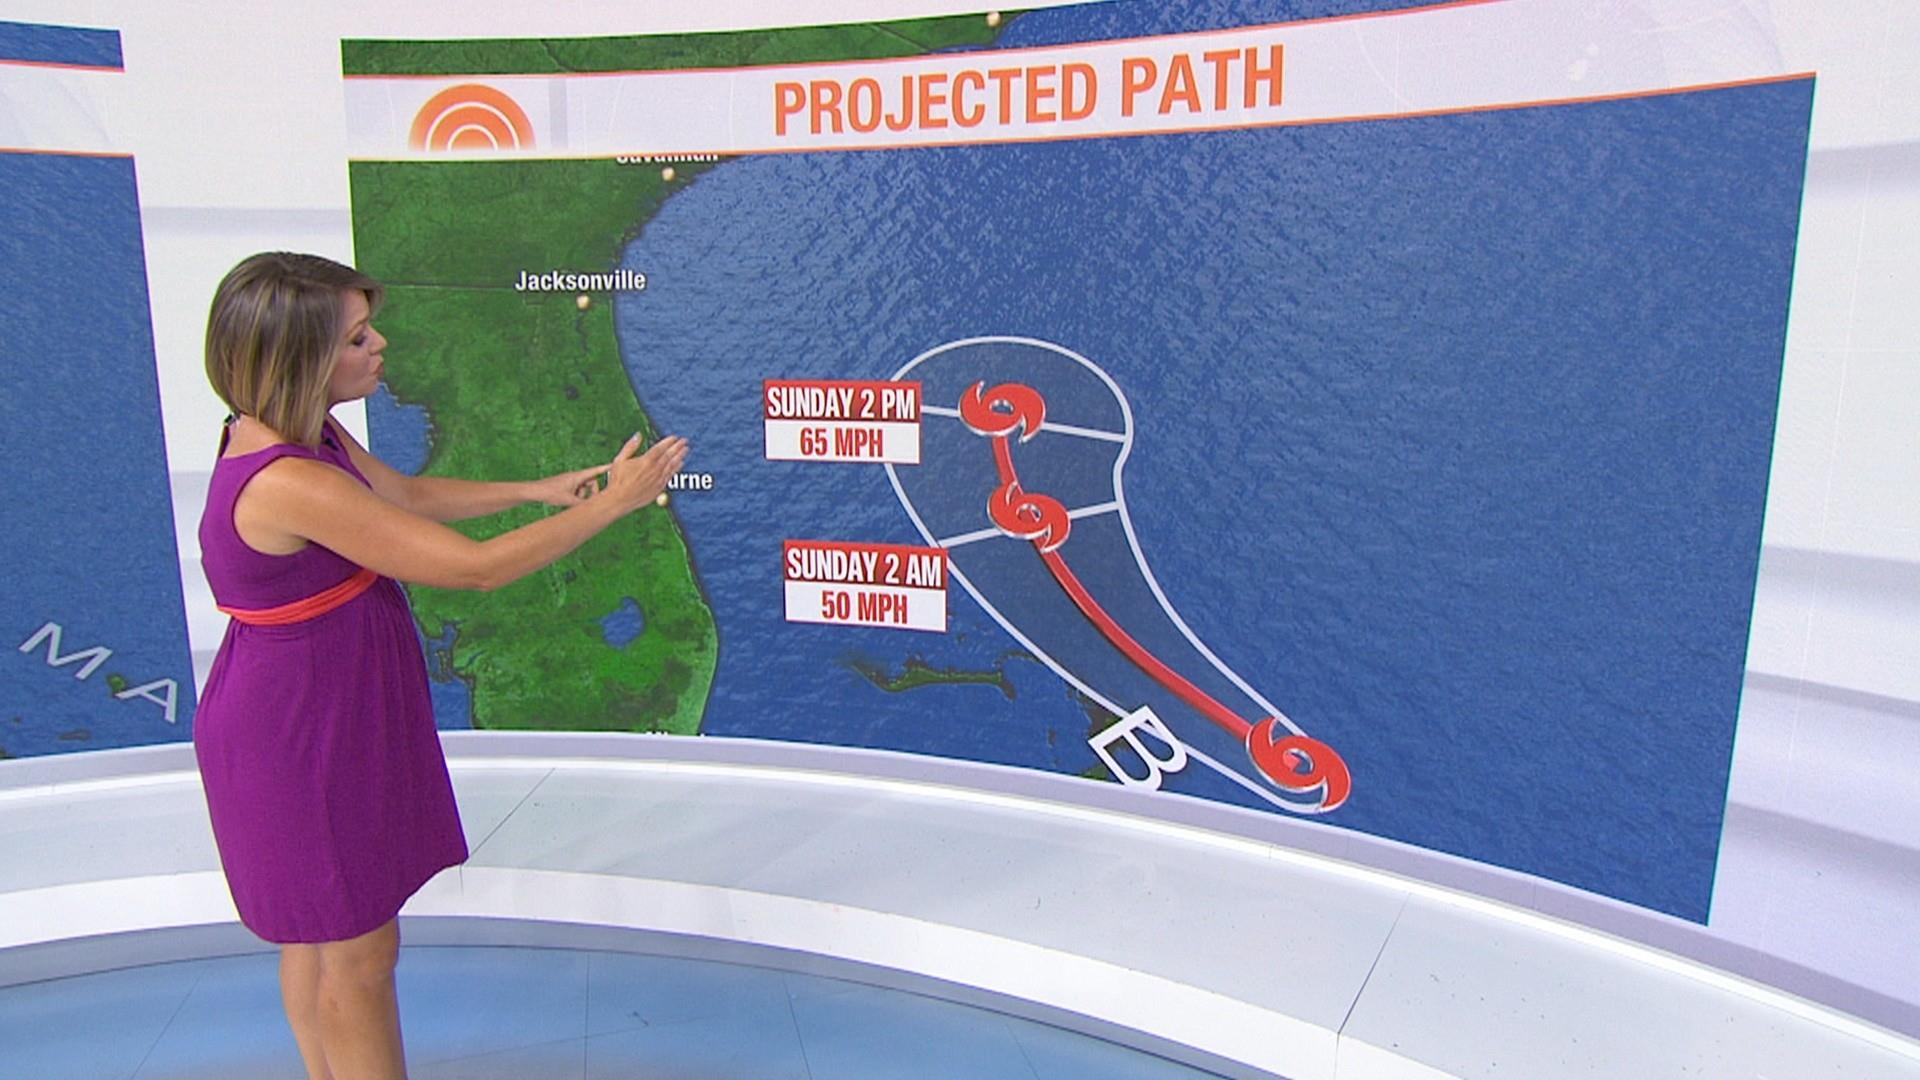 Bahamas, recovering from Hurricane Dorian, faces Tropical Storm Humberto